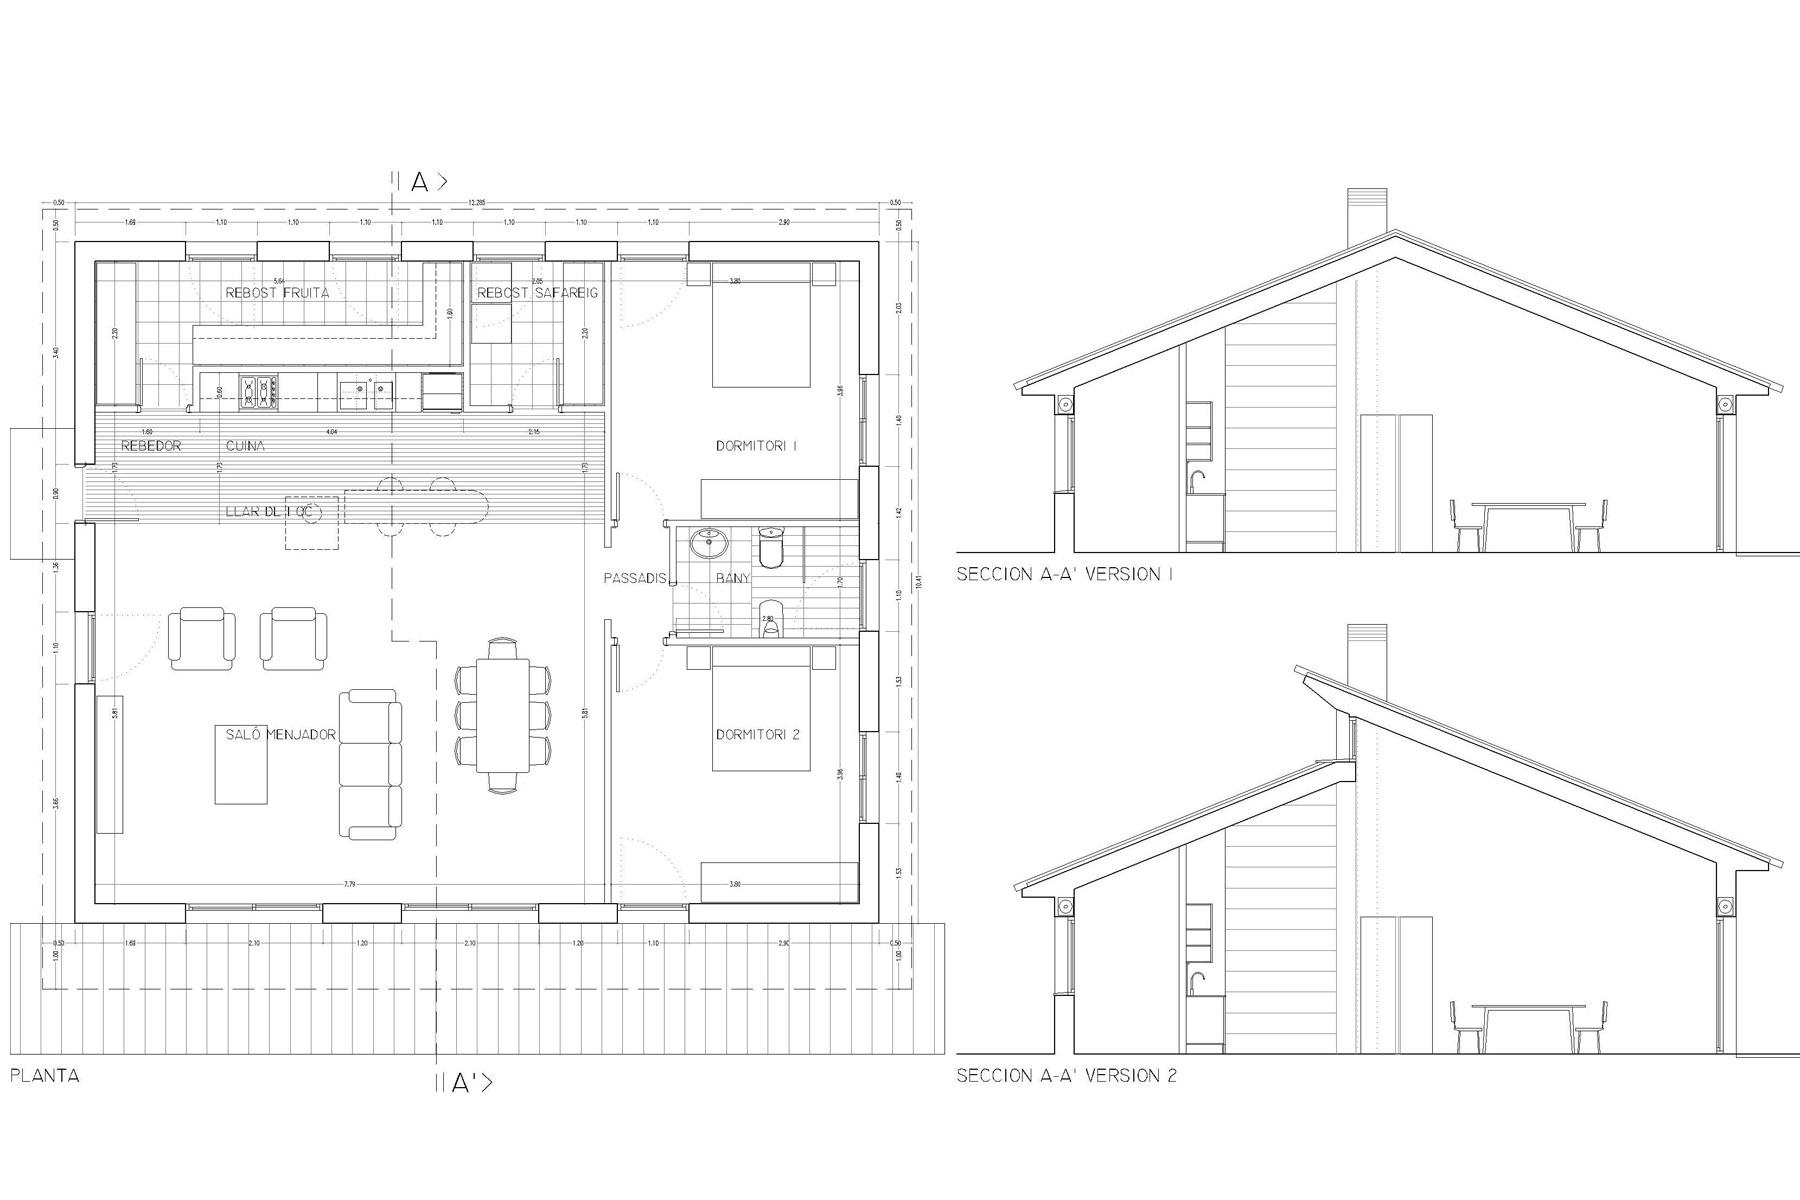 Casa-Sales-Prefabricated-Single-Family-House-Sales-de-Llierca-Girona-02Casa-Sales-Prefabricated-Single-Family-House-Sales-de-Llierca-Girona-02